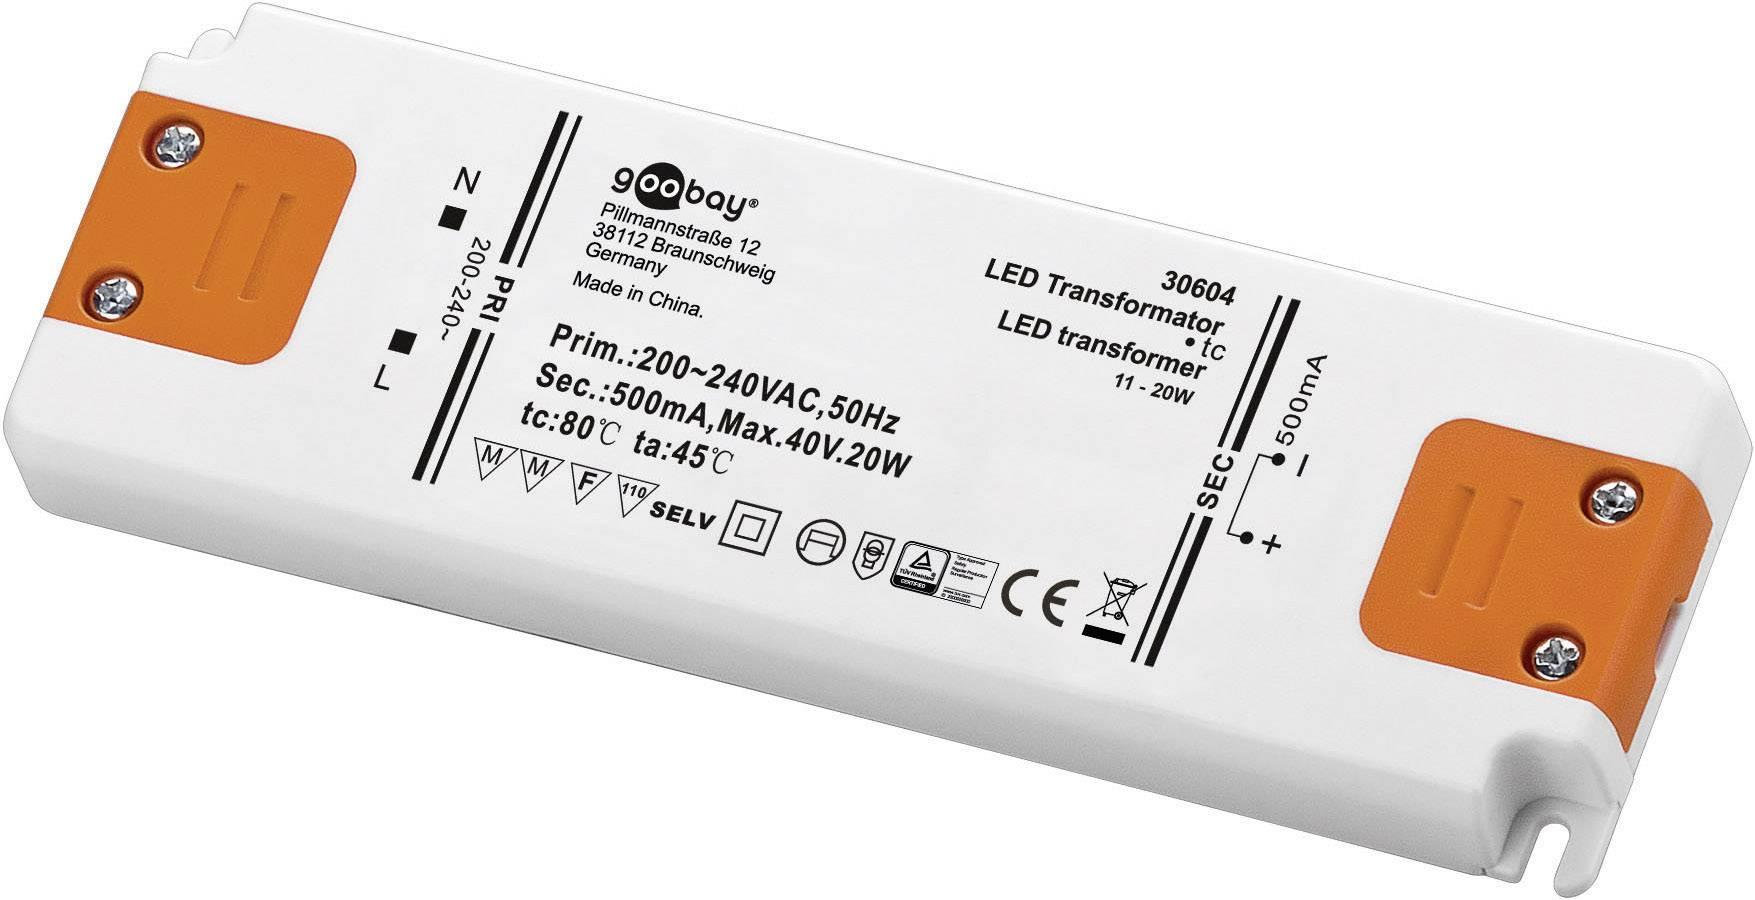 Vstavateľný LED driver Goobay SET CC 500-20 LED, 20 W (max), 0.5 A, 0 - 40 V/DC